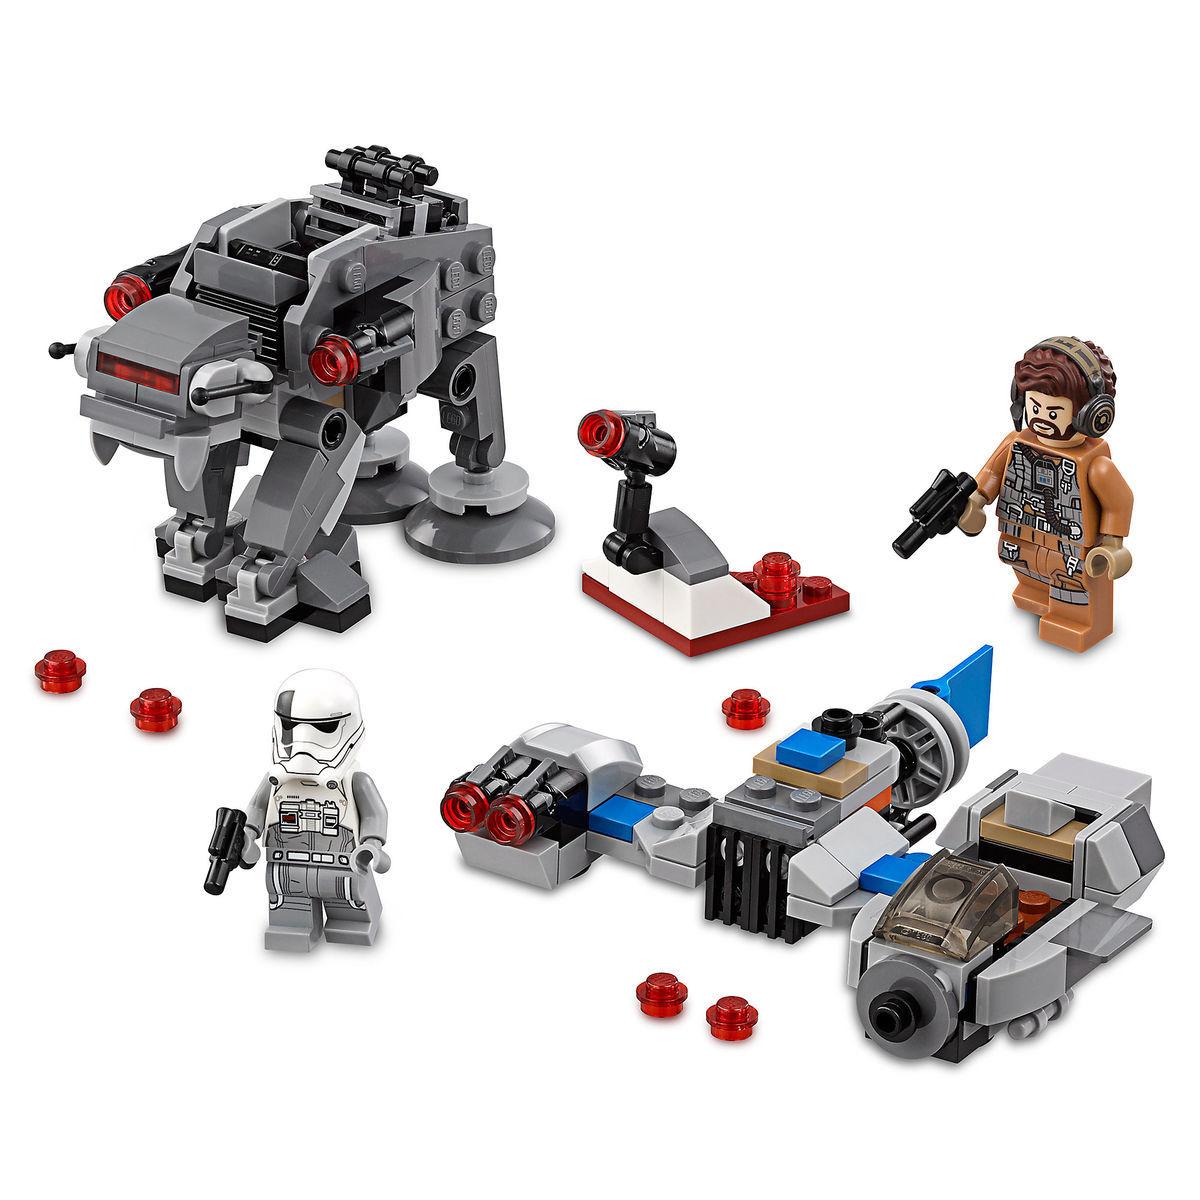 Ski Speeder Vs First Order Walker Microfighters Playset By Lego